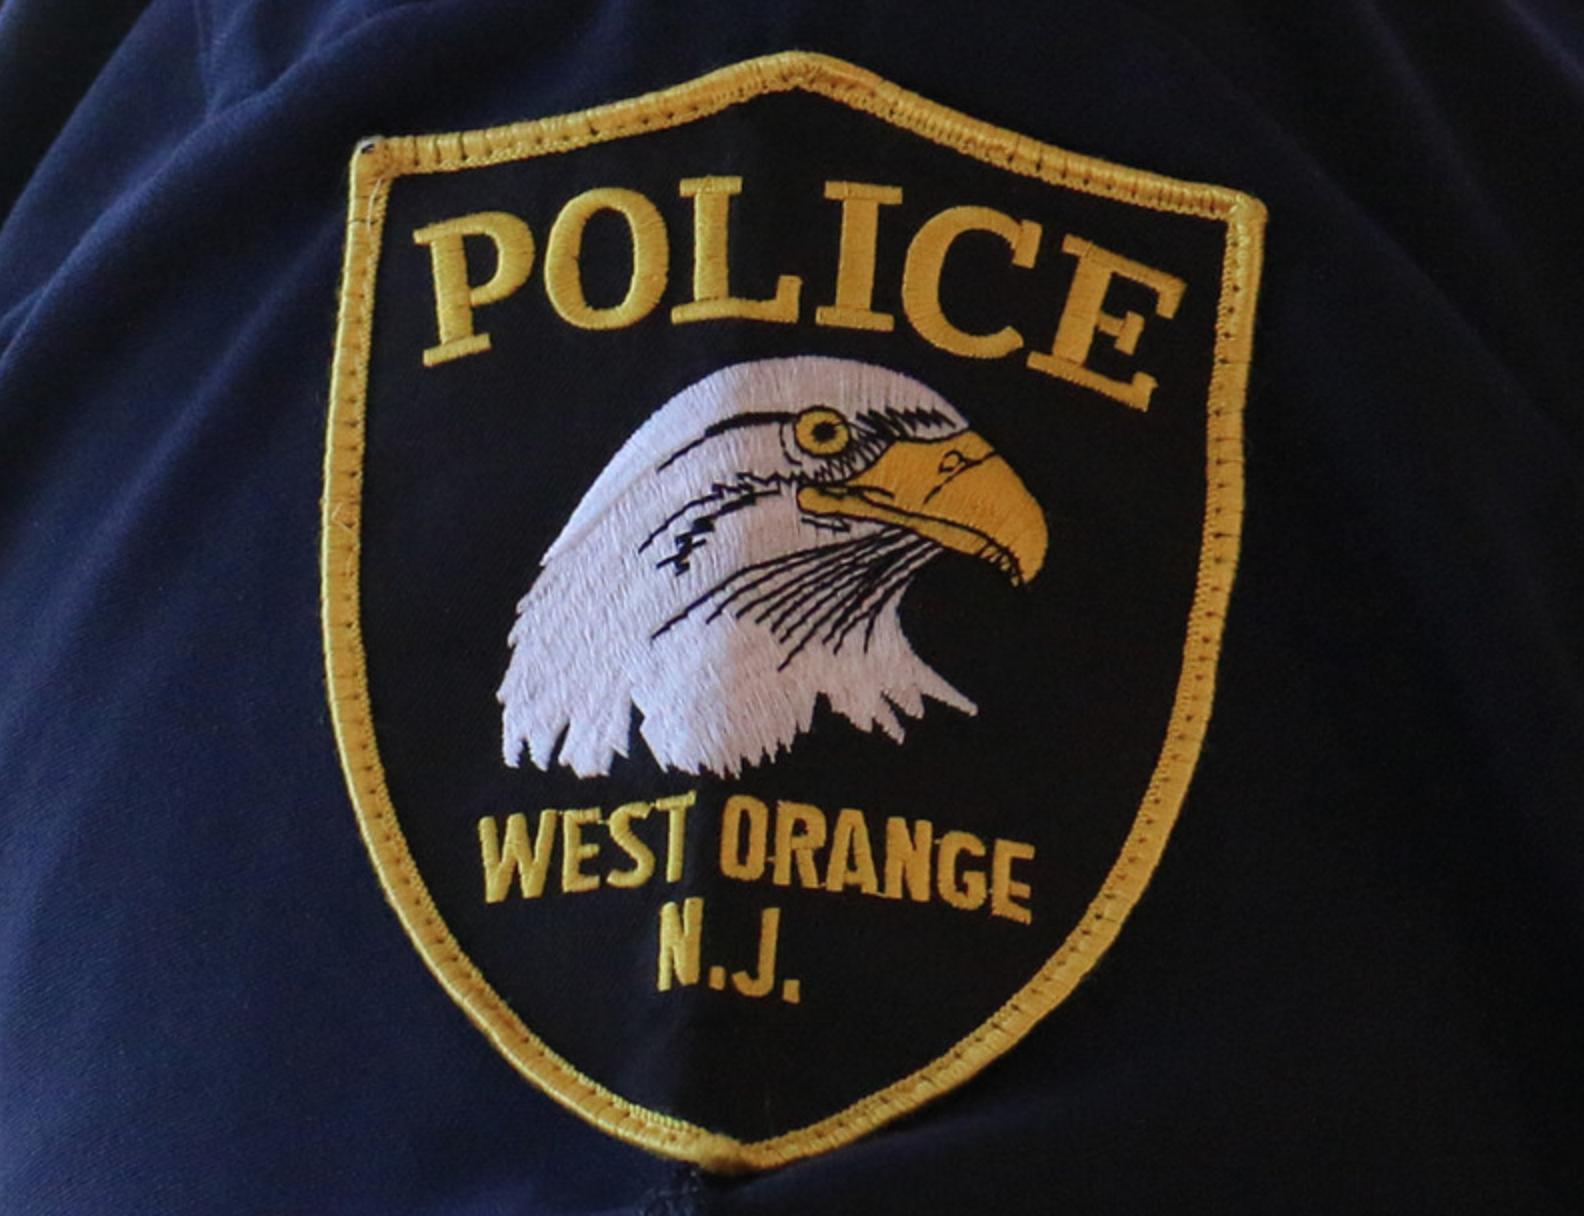 19c141f05362255d277f_West_Orange_Police.jpg